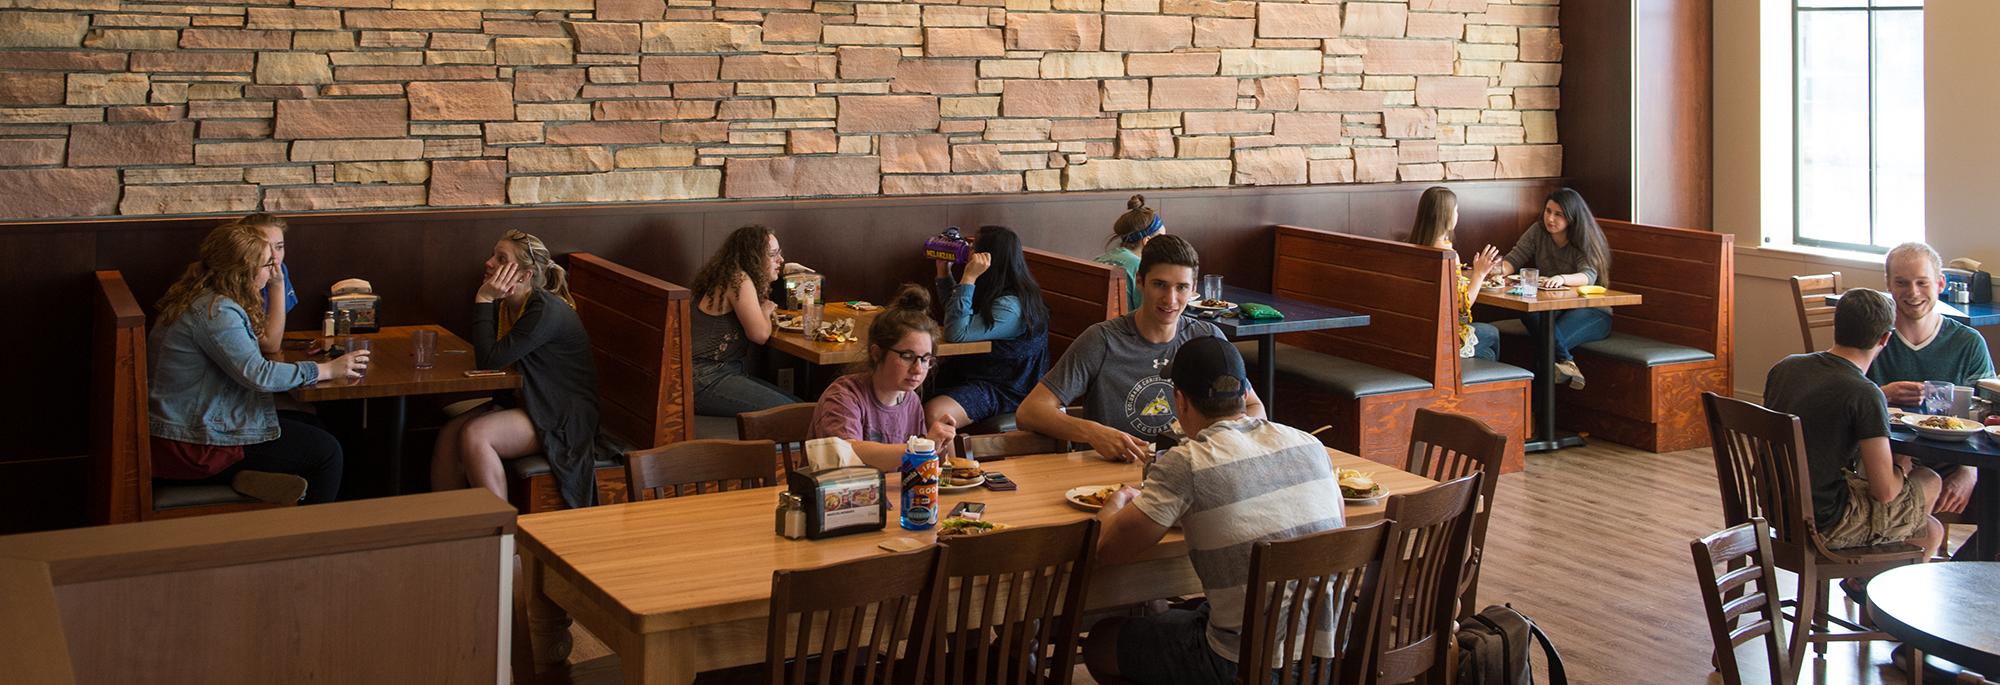 Meal Plans Colorado Christian University